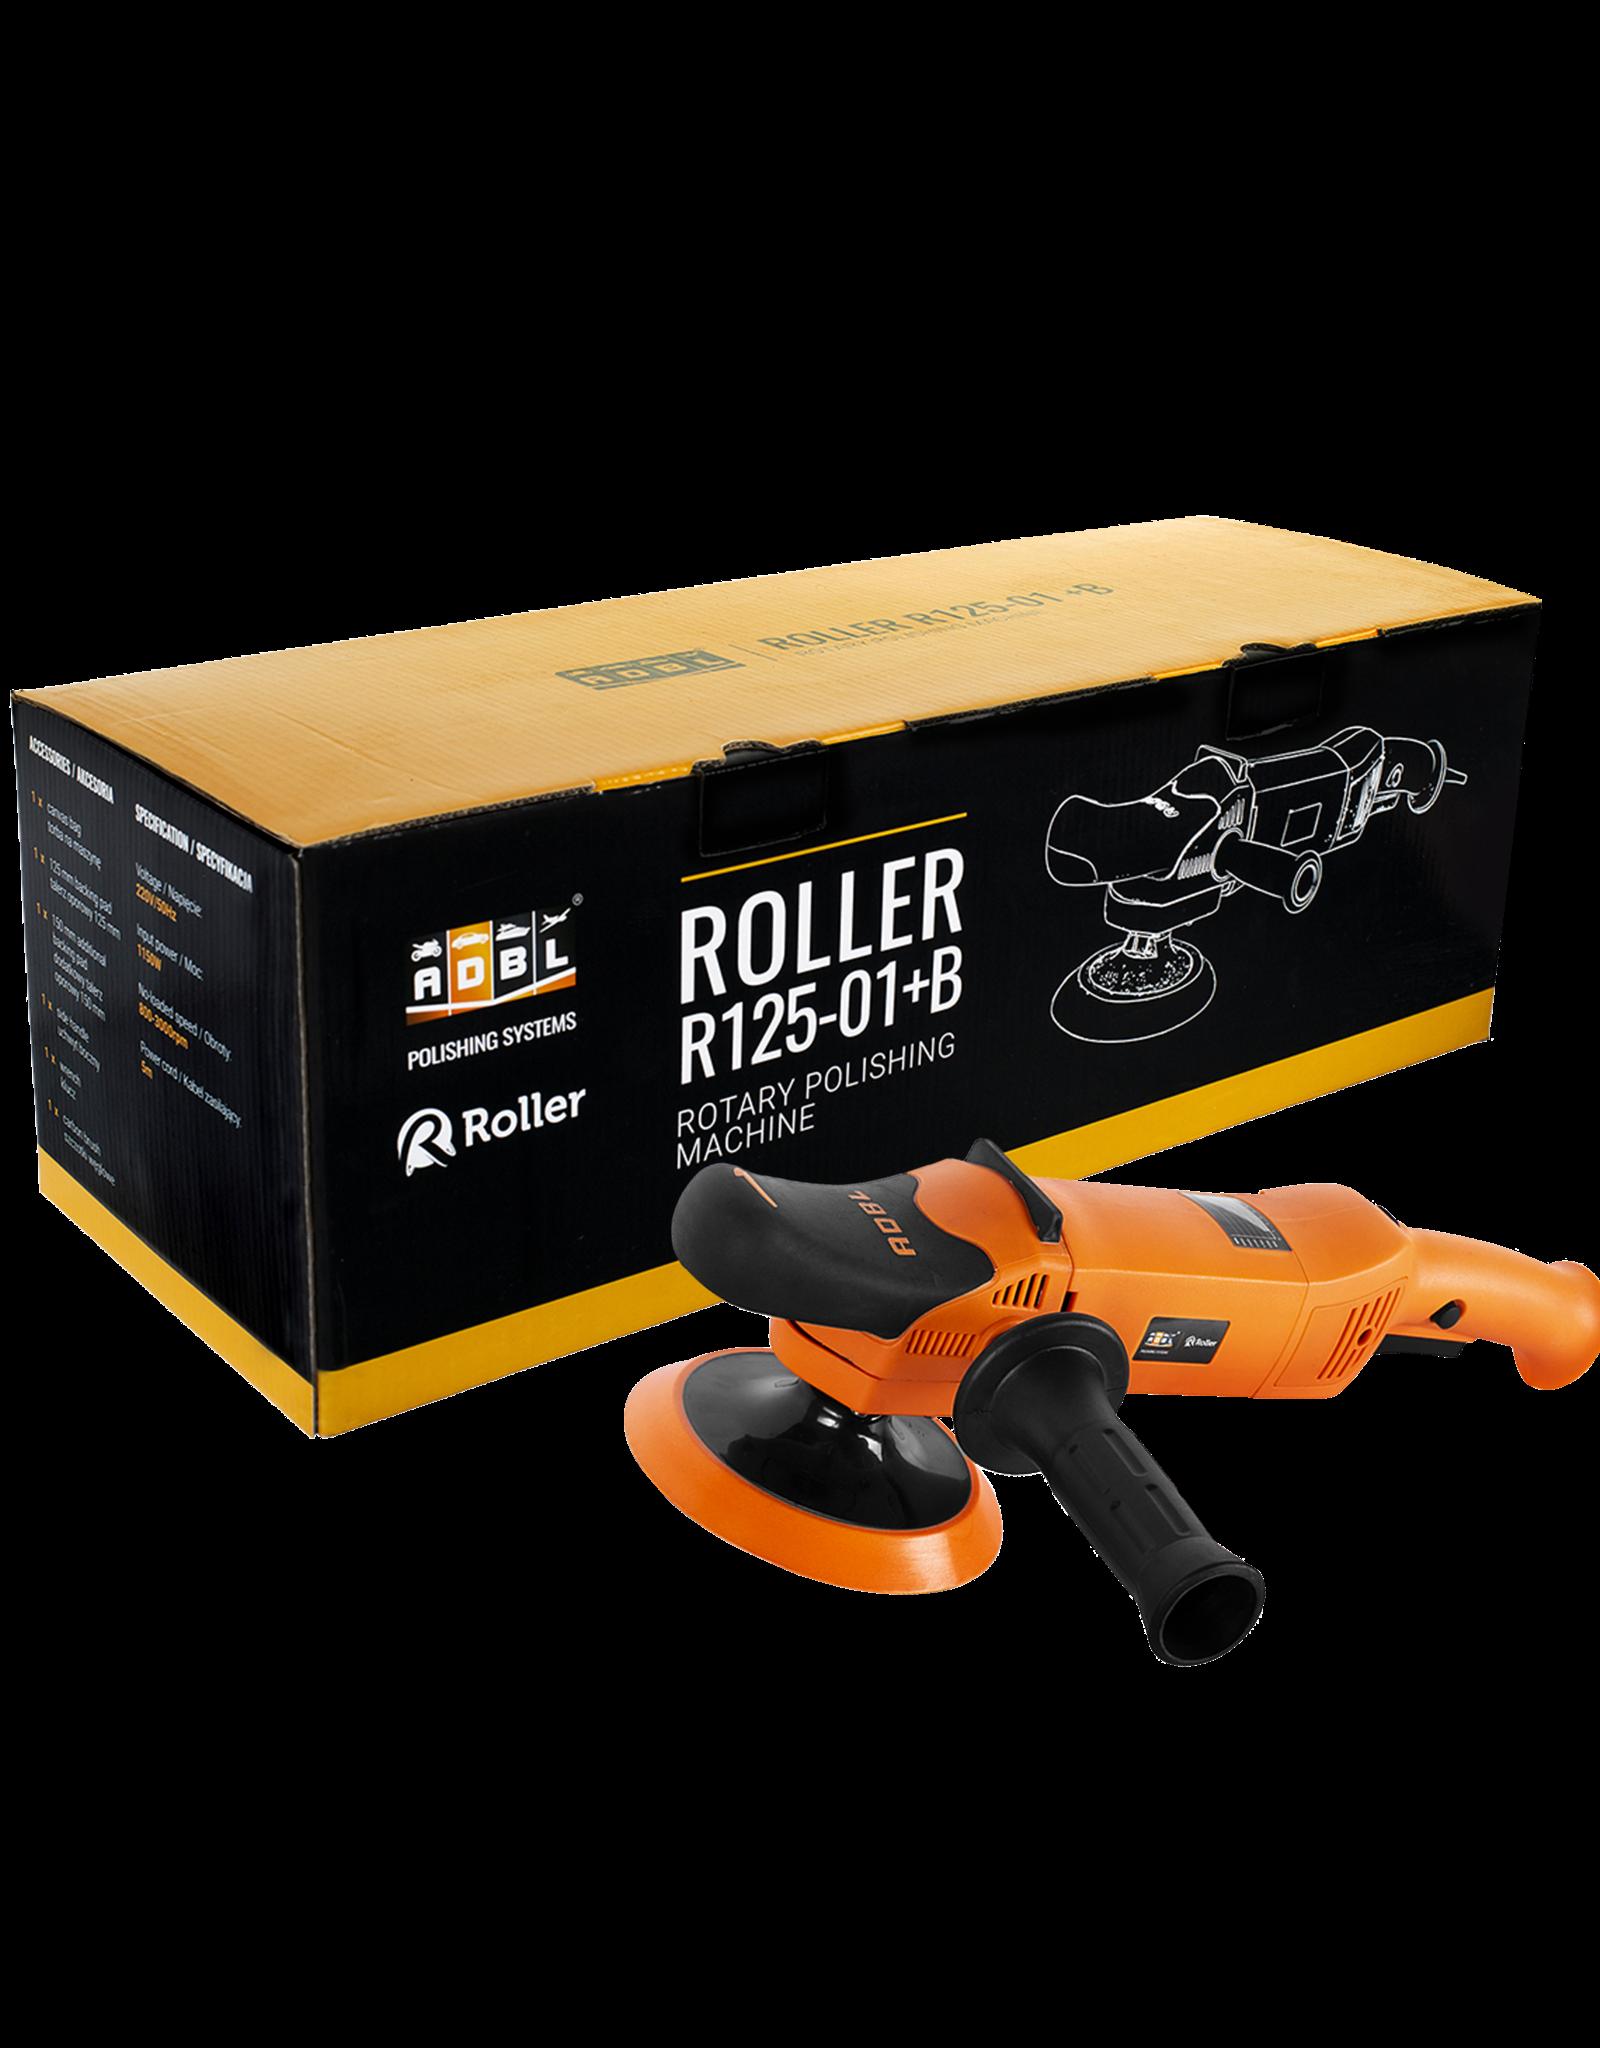 ADBL Roller R125-01